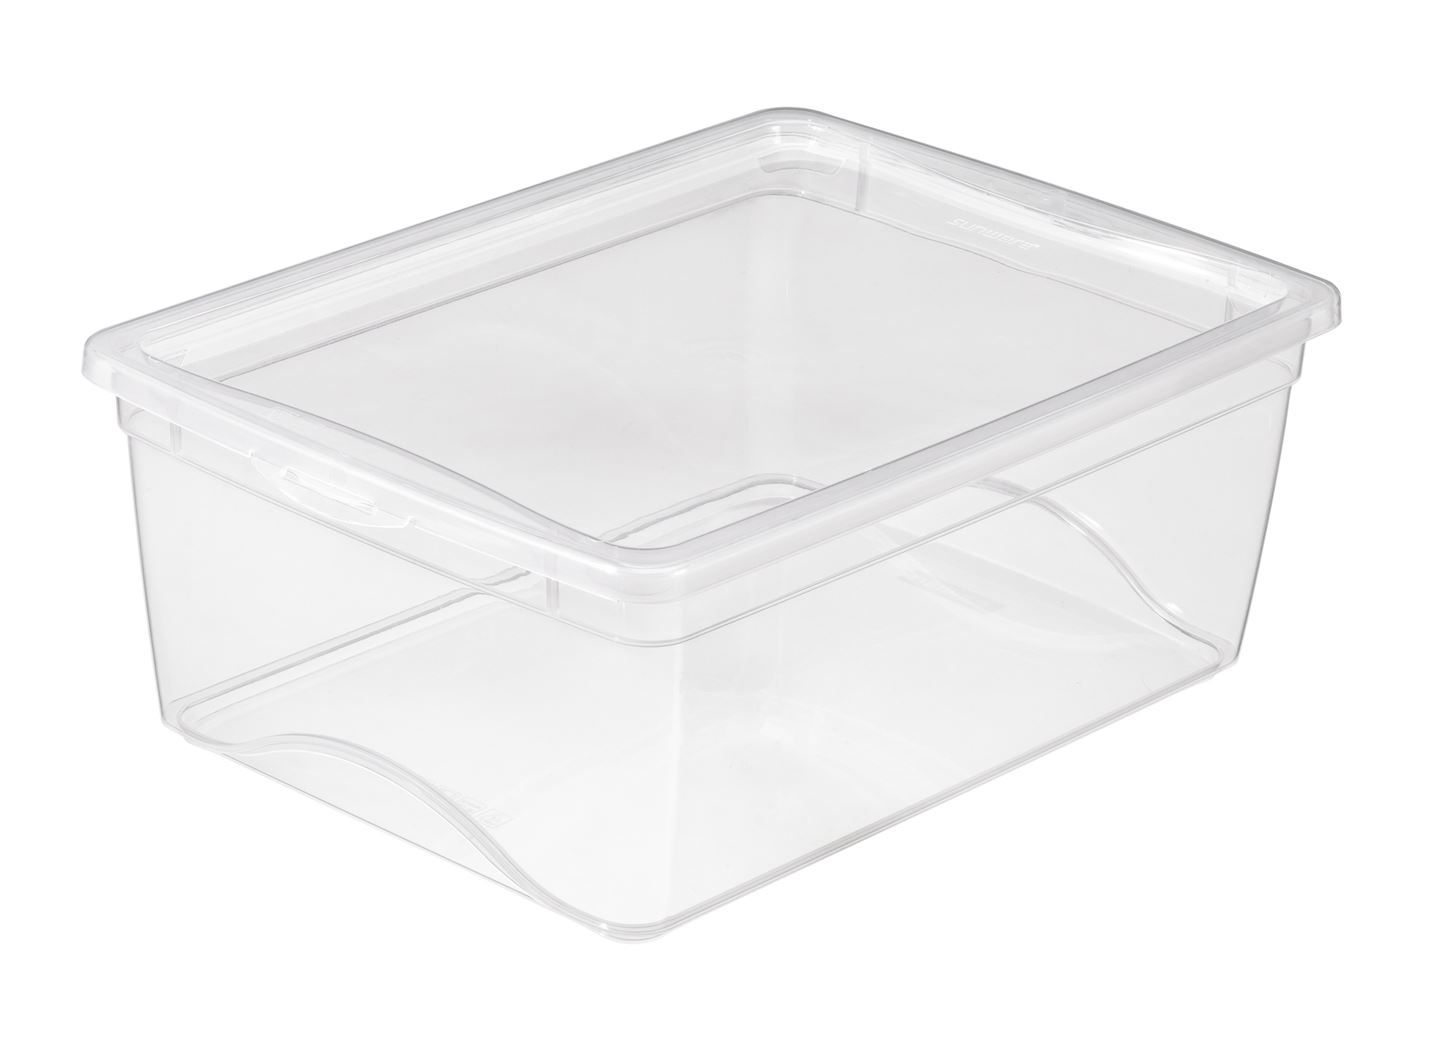 sunware omega clearbox met deksel transparant